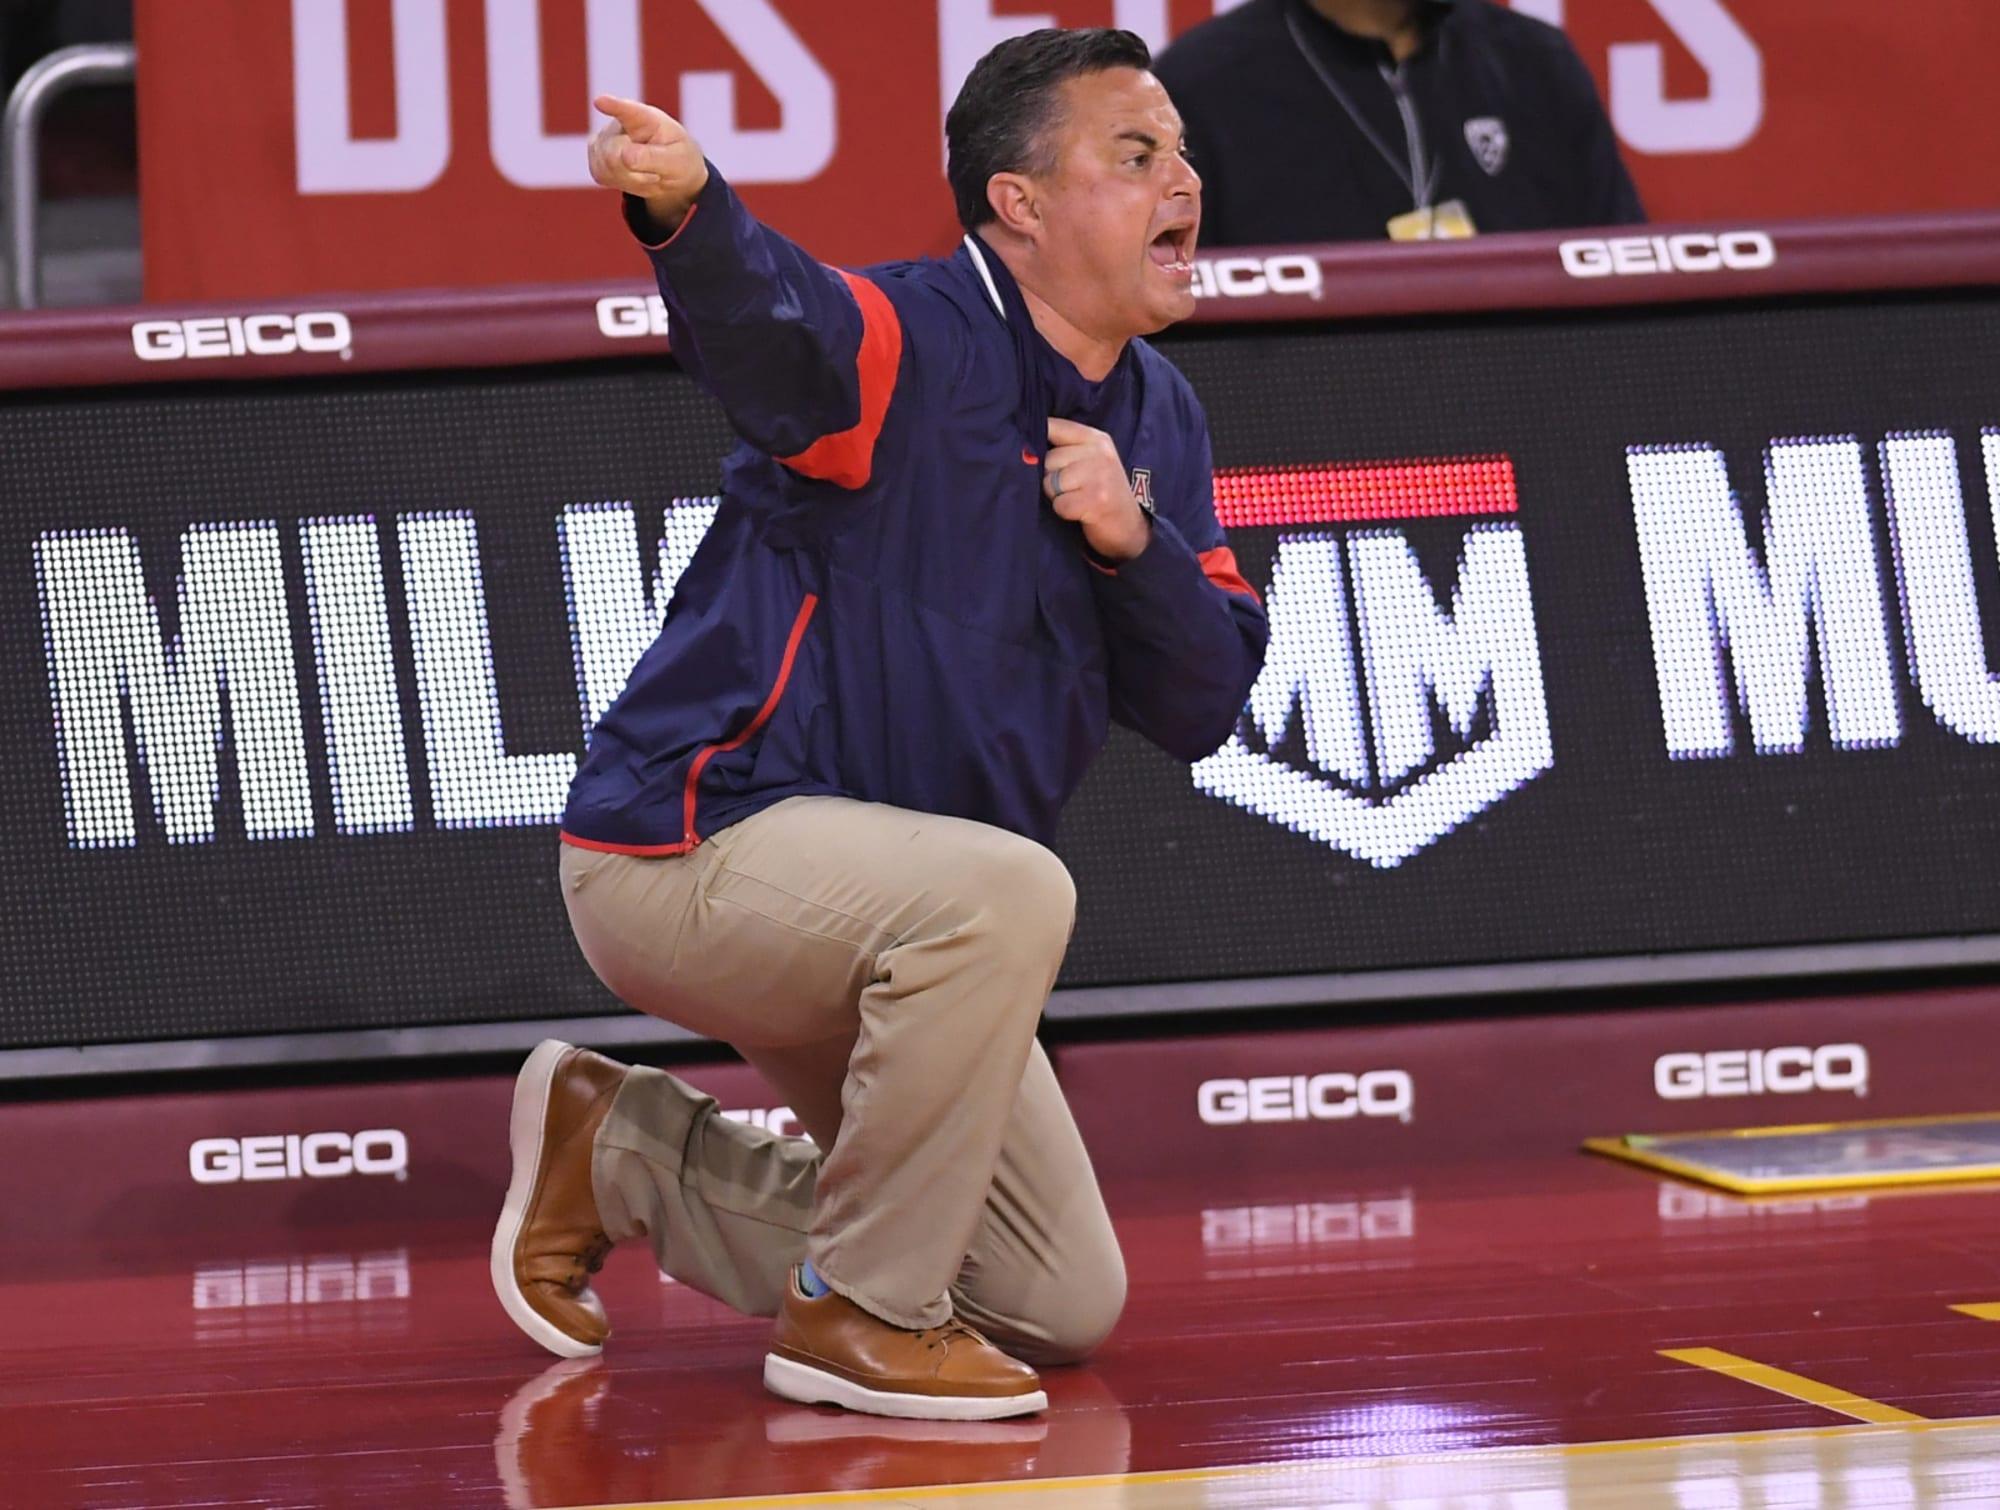 Arizona Basketball would be foolish to fire Sean Miller